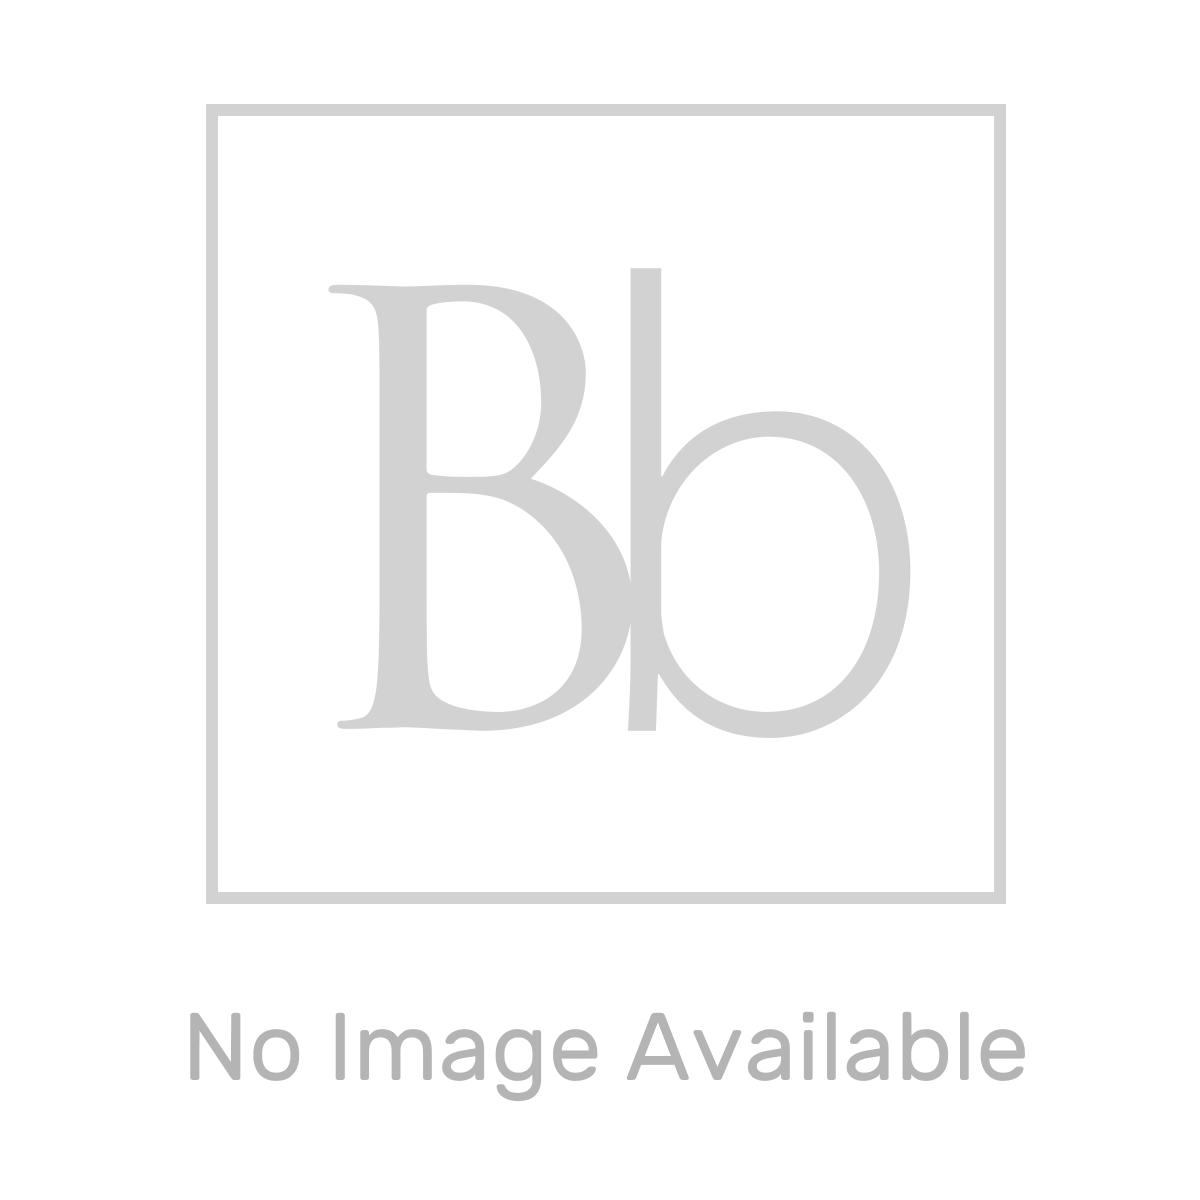 RAK Waterless Urinal System Replacement Valves